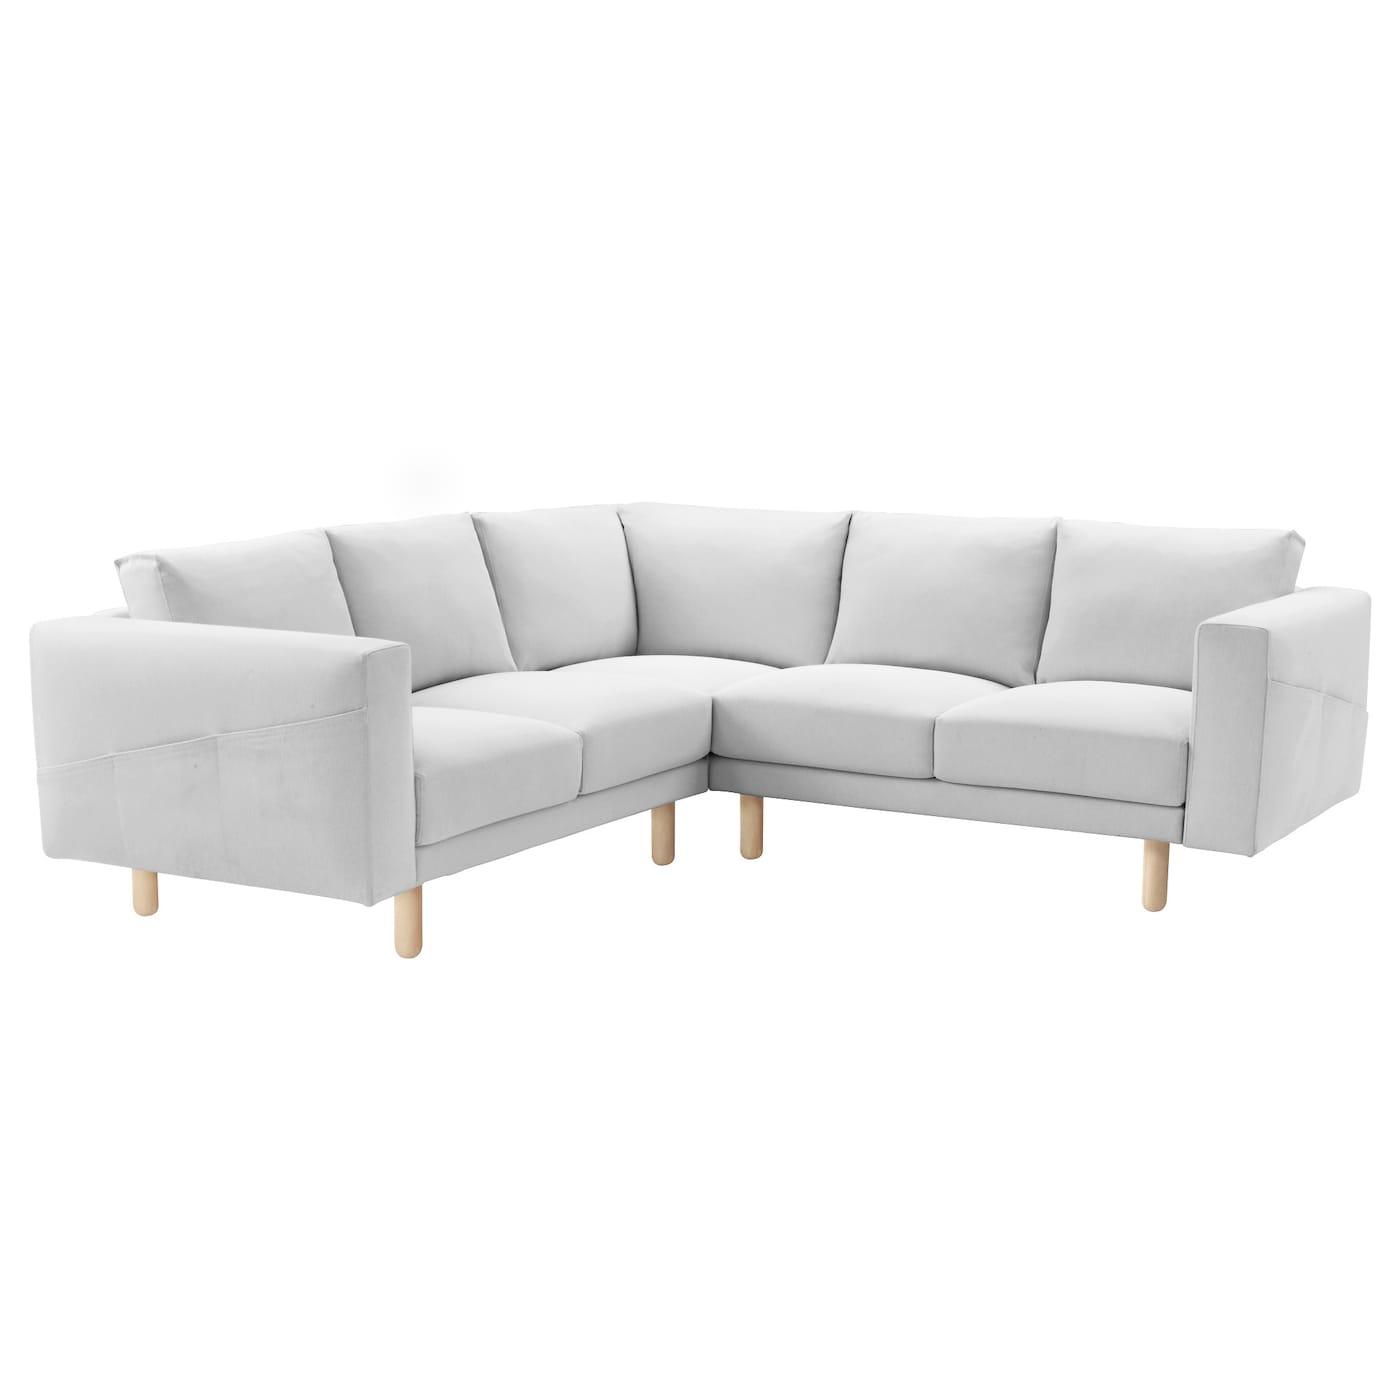 norsborg corner sofa 4 seat finnsta white birch ikea. Black Bedroom Furniture Sets. Home Design Ideas